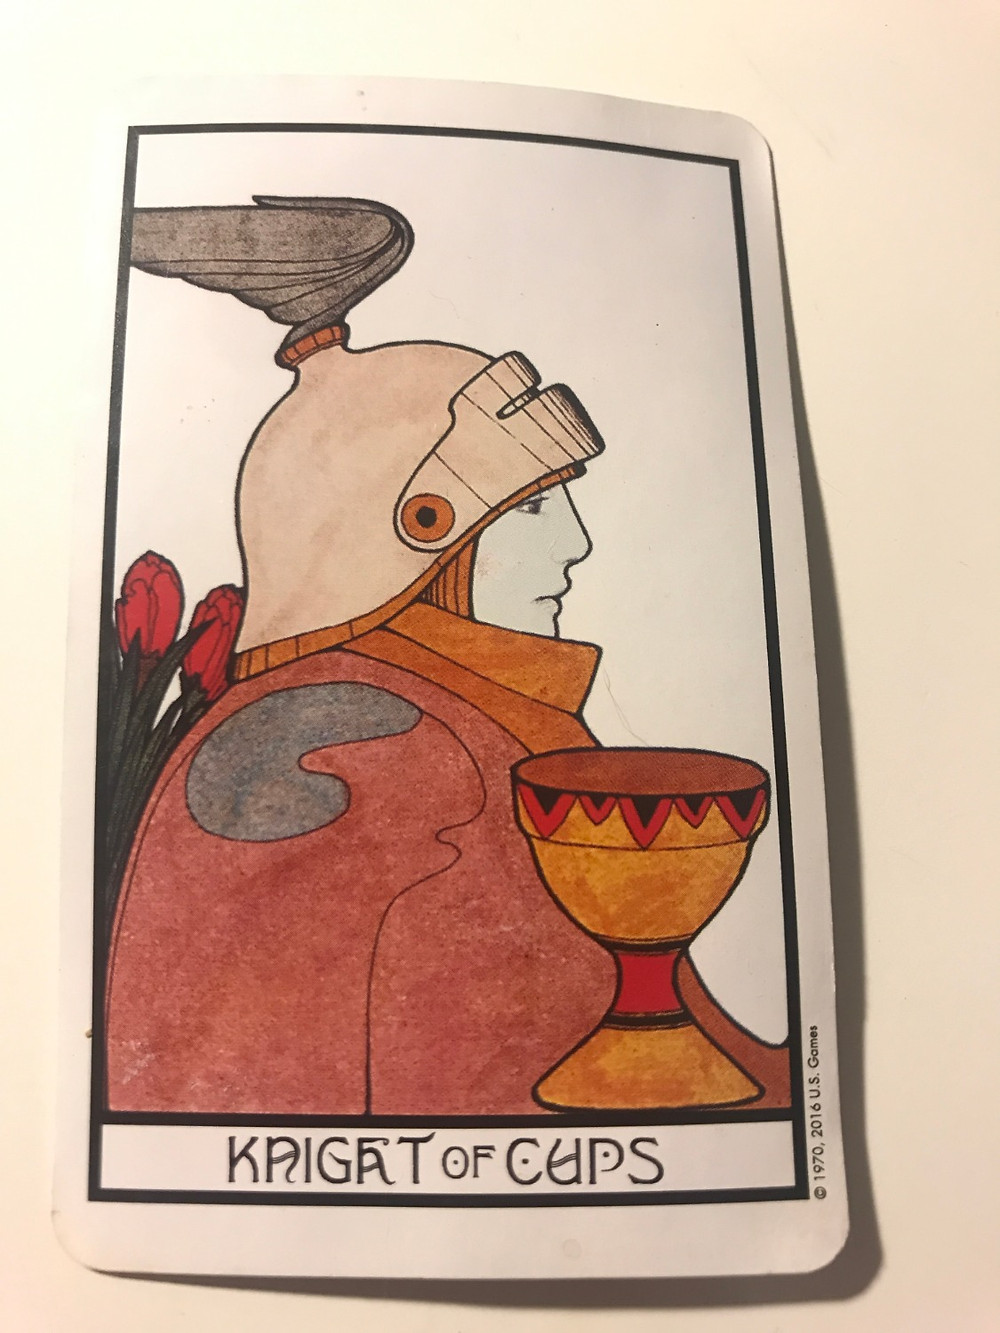 Knight of Cups Tarot Card from the Aquarian Tarot